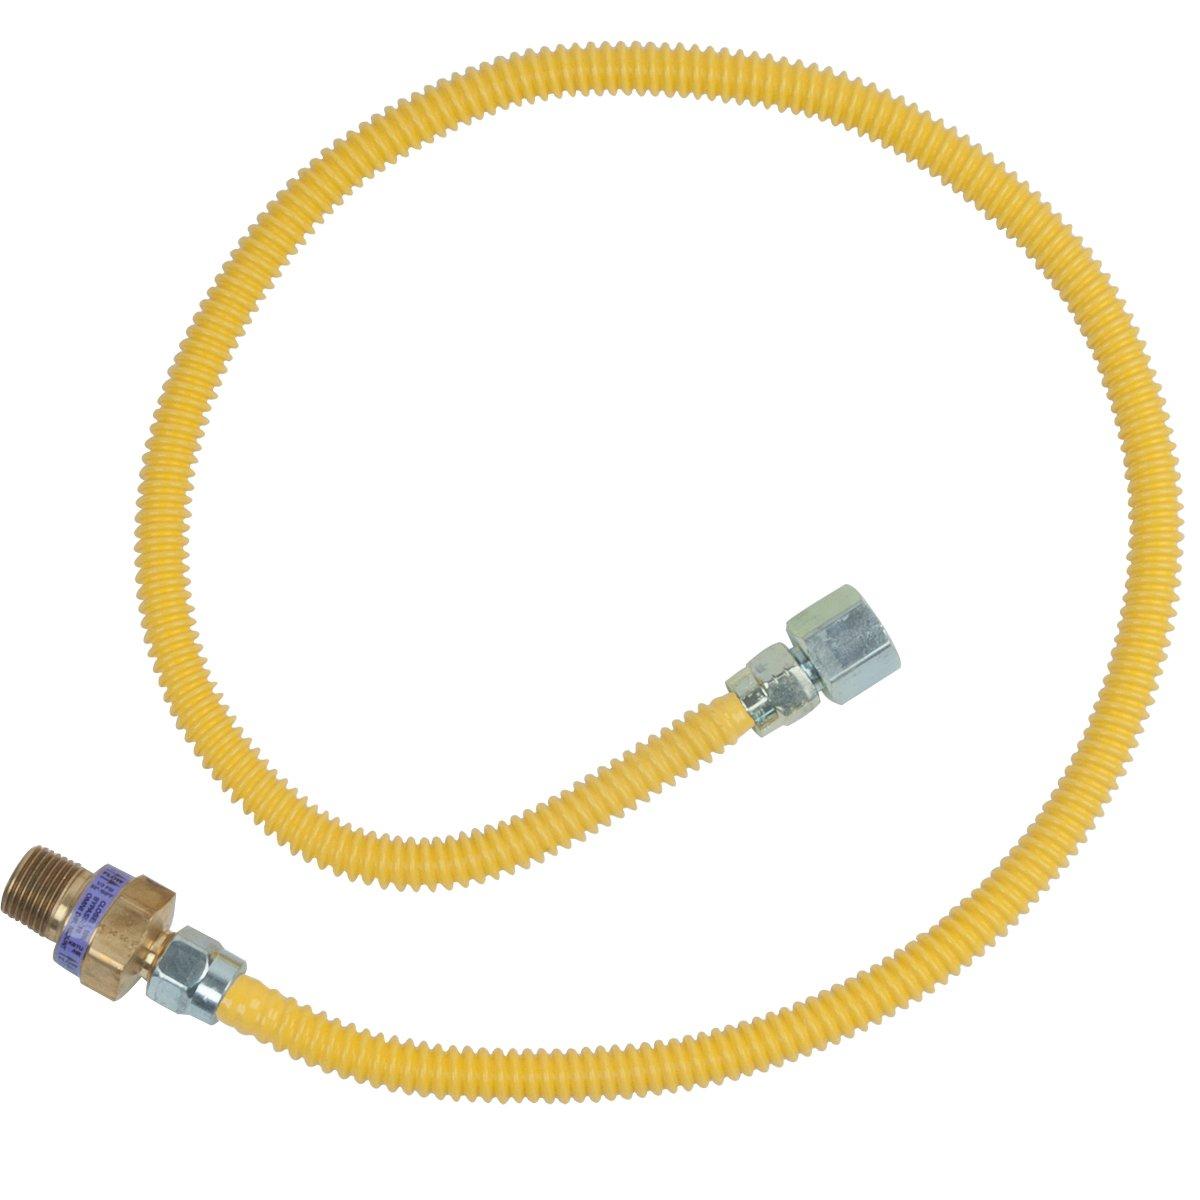 BrassCraft CSSL115R-36 P Safety Plus Gas 3/8'' Od Connector With 3/8'' Female Flare Efv x 1/2'' Fip x 36''